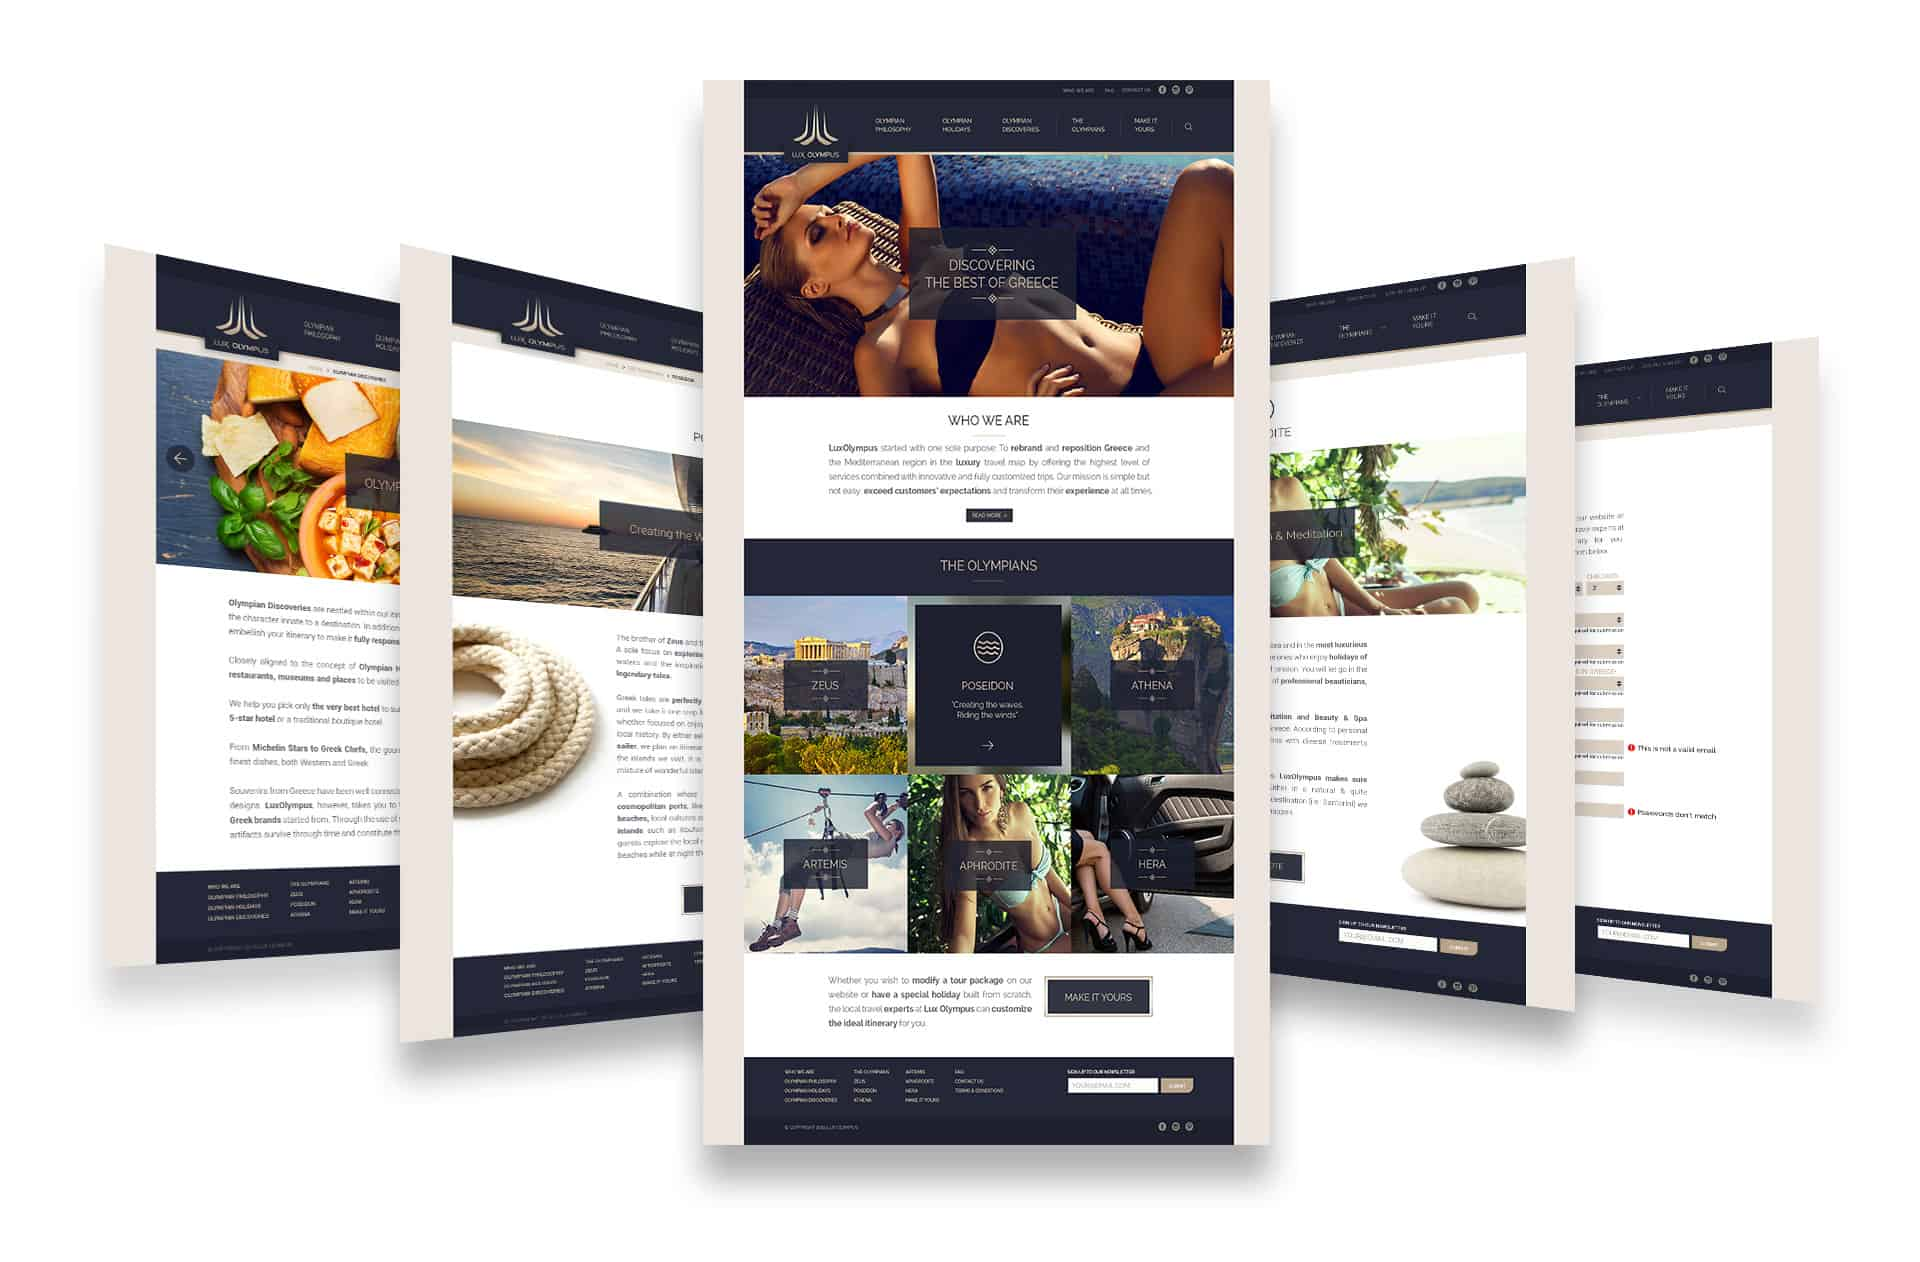 PROPAGANDA - luxolympus site pages